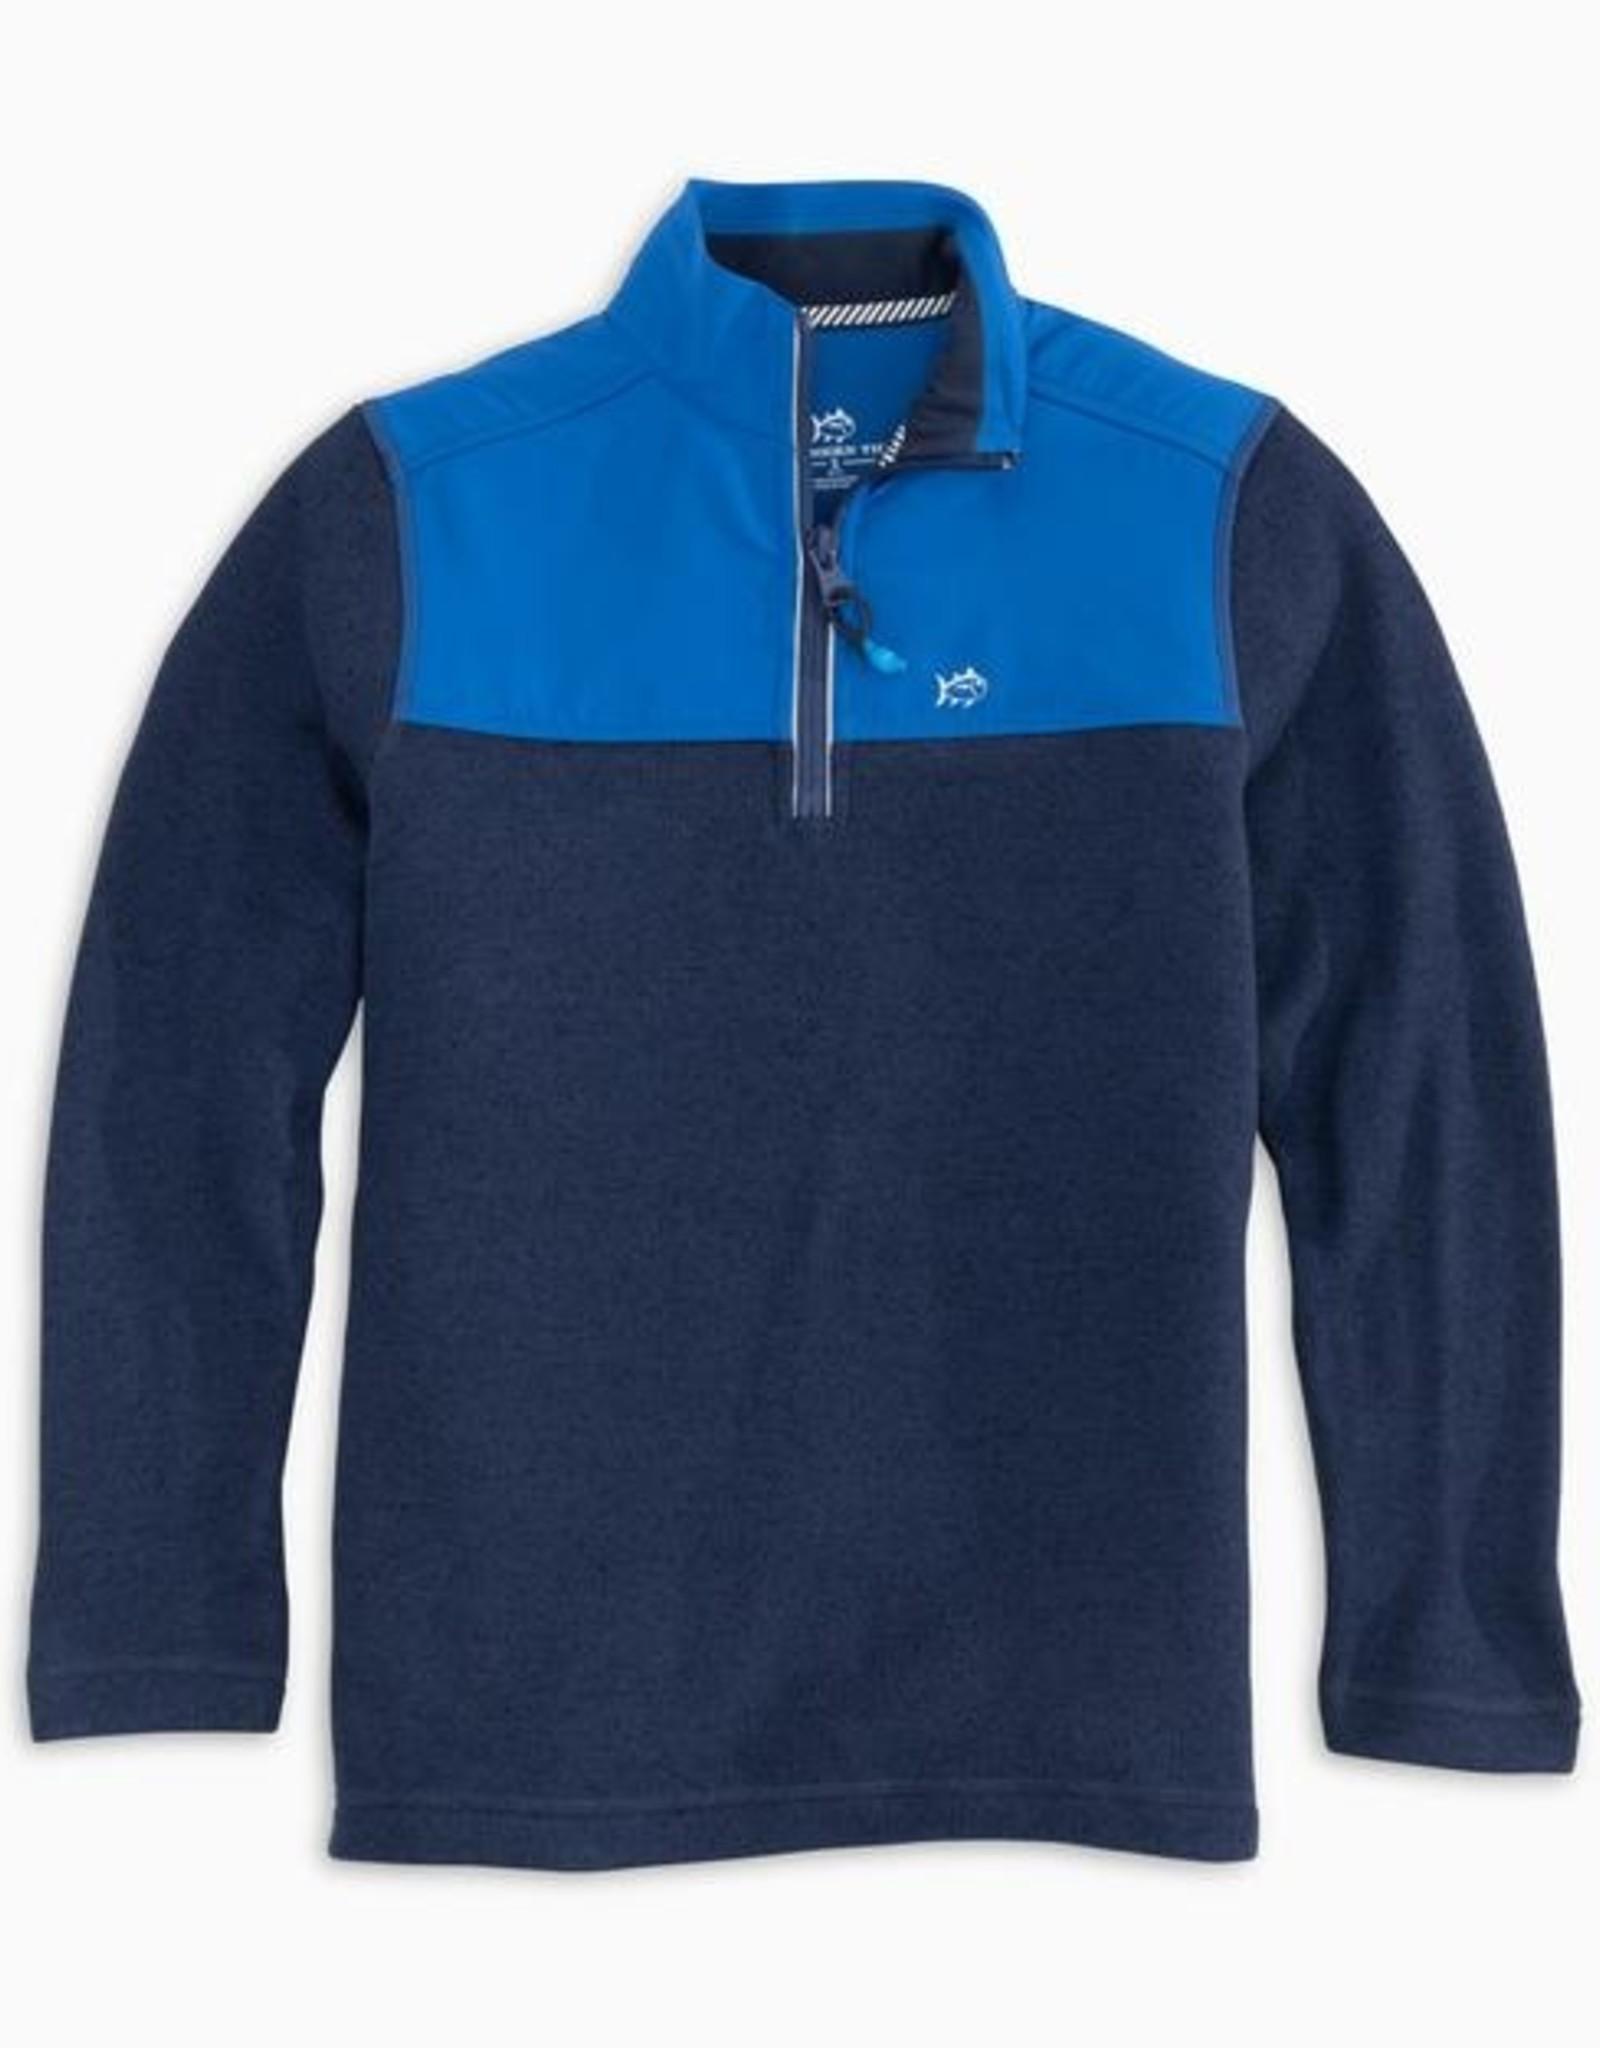 Southern Tide True Navy Sweater Fleece Quarter Zip